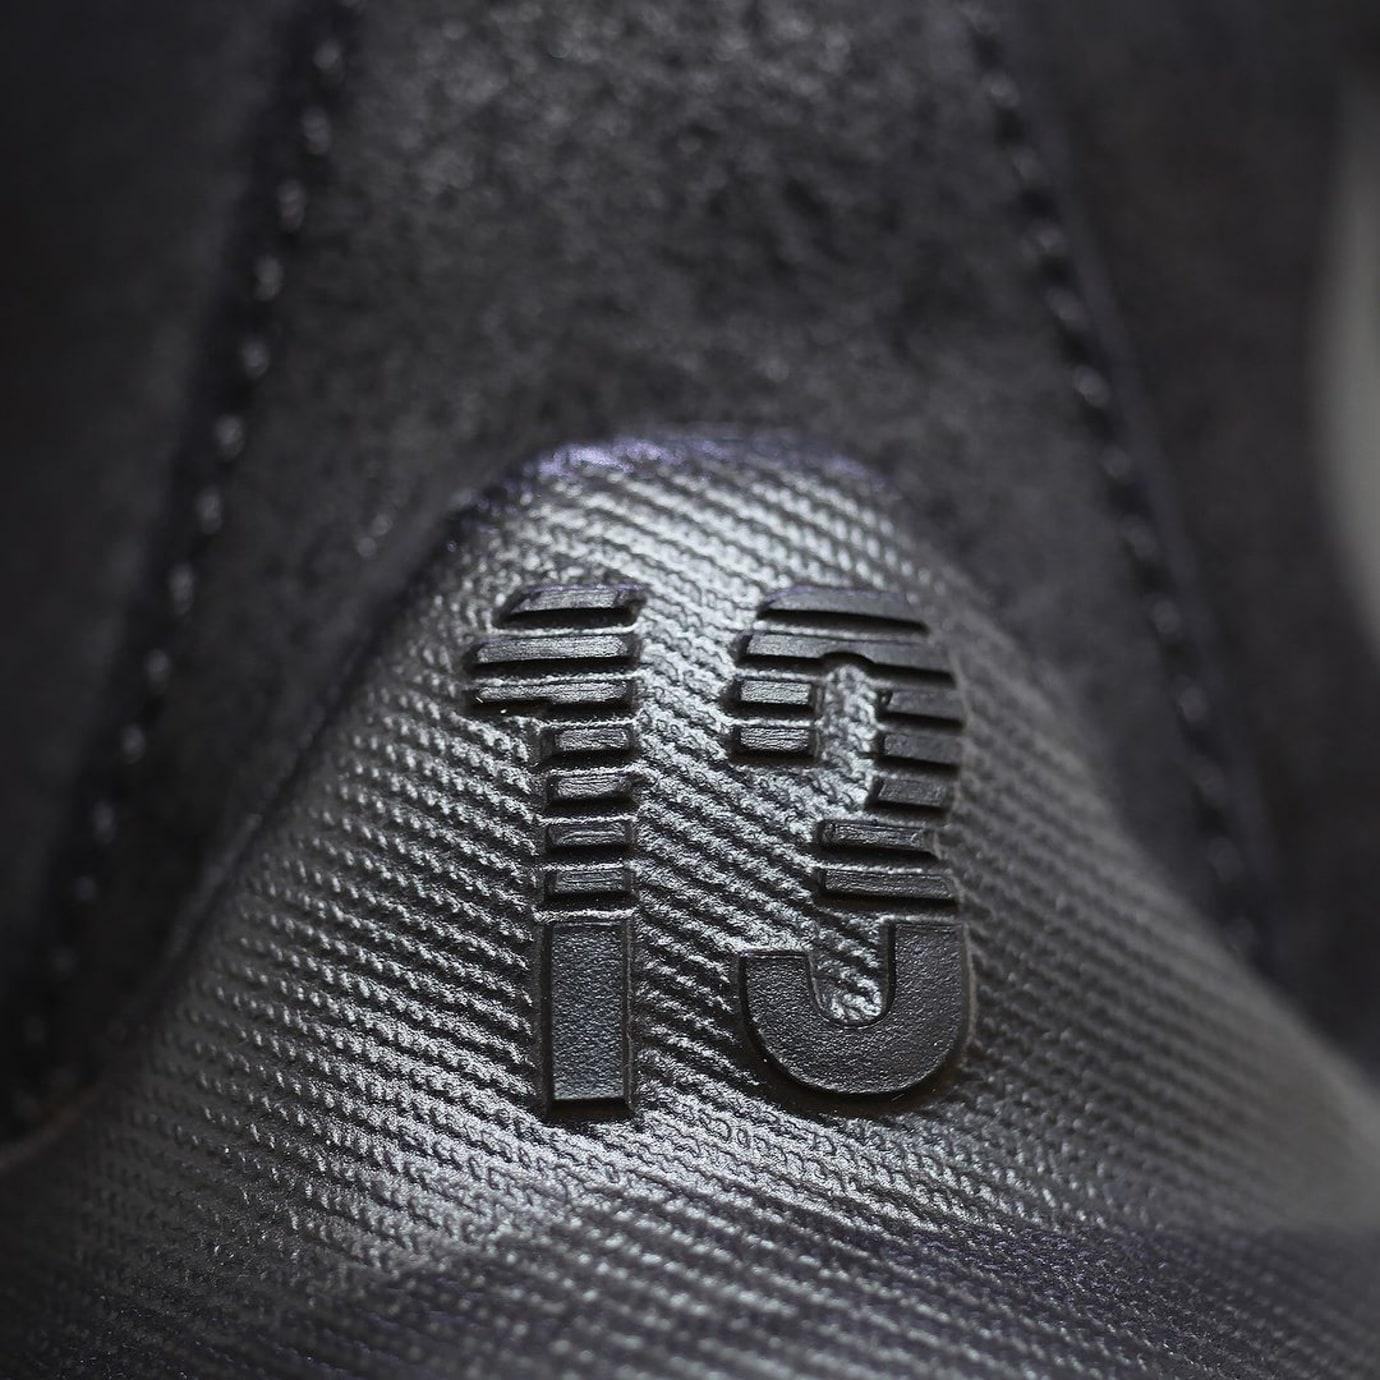 Nike PG1 Black Gum Release Date 878627-004 (14)